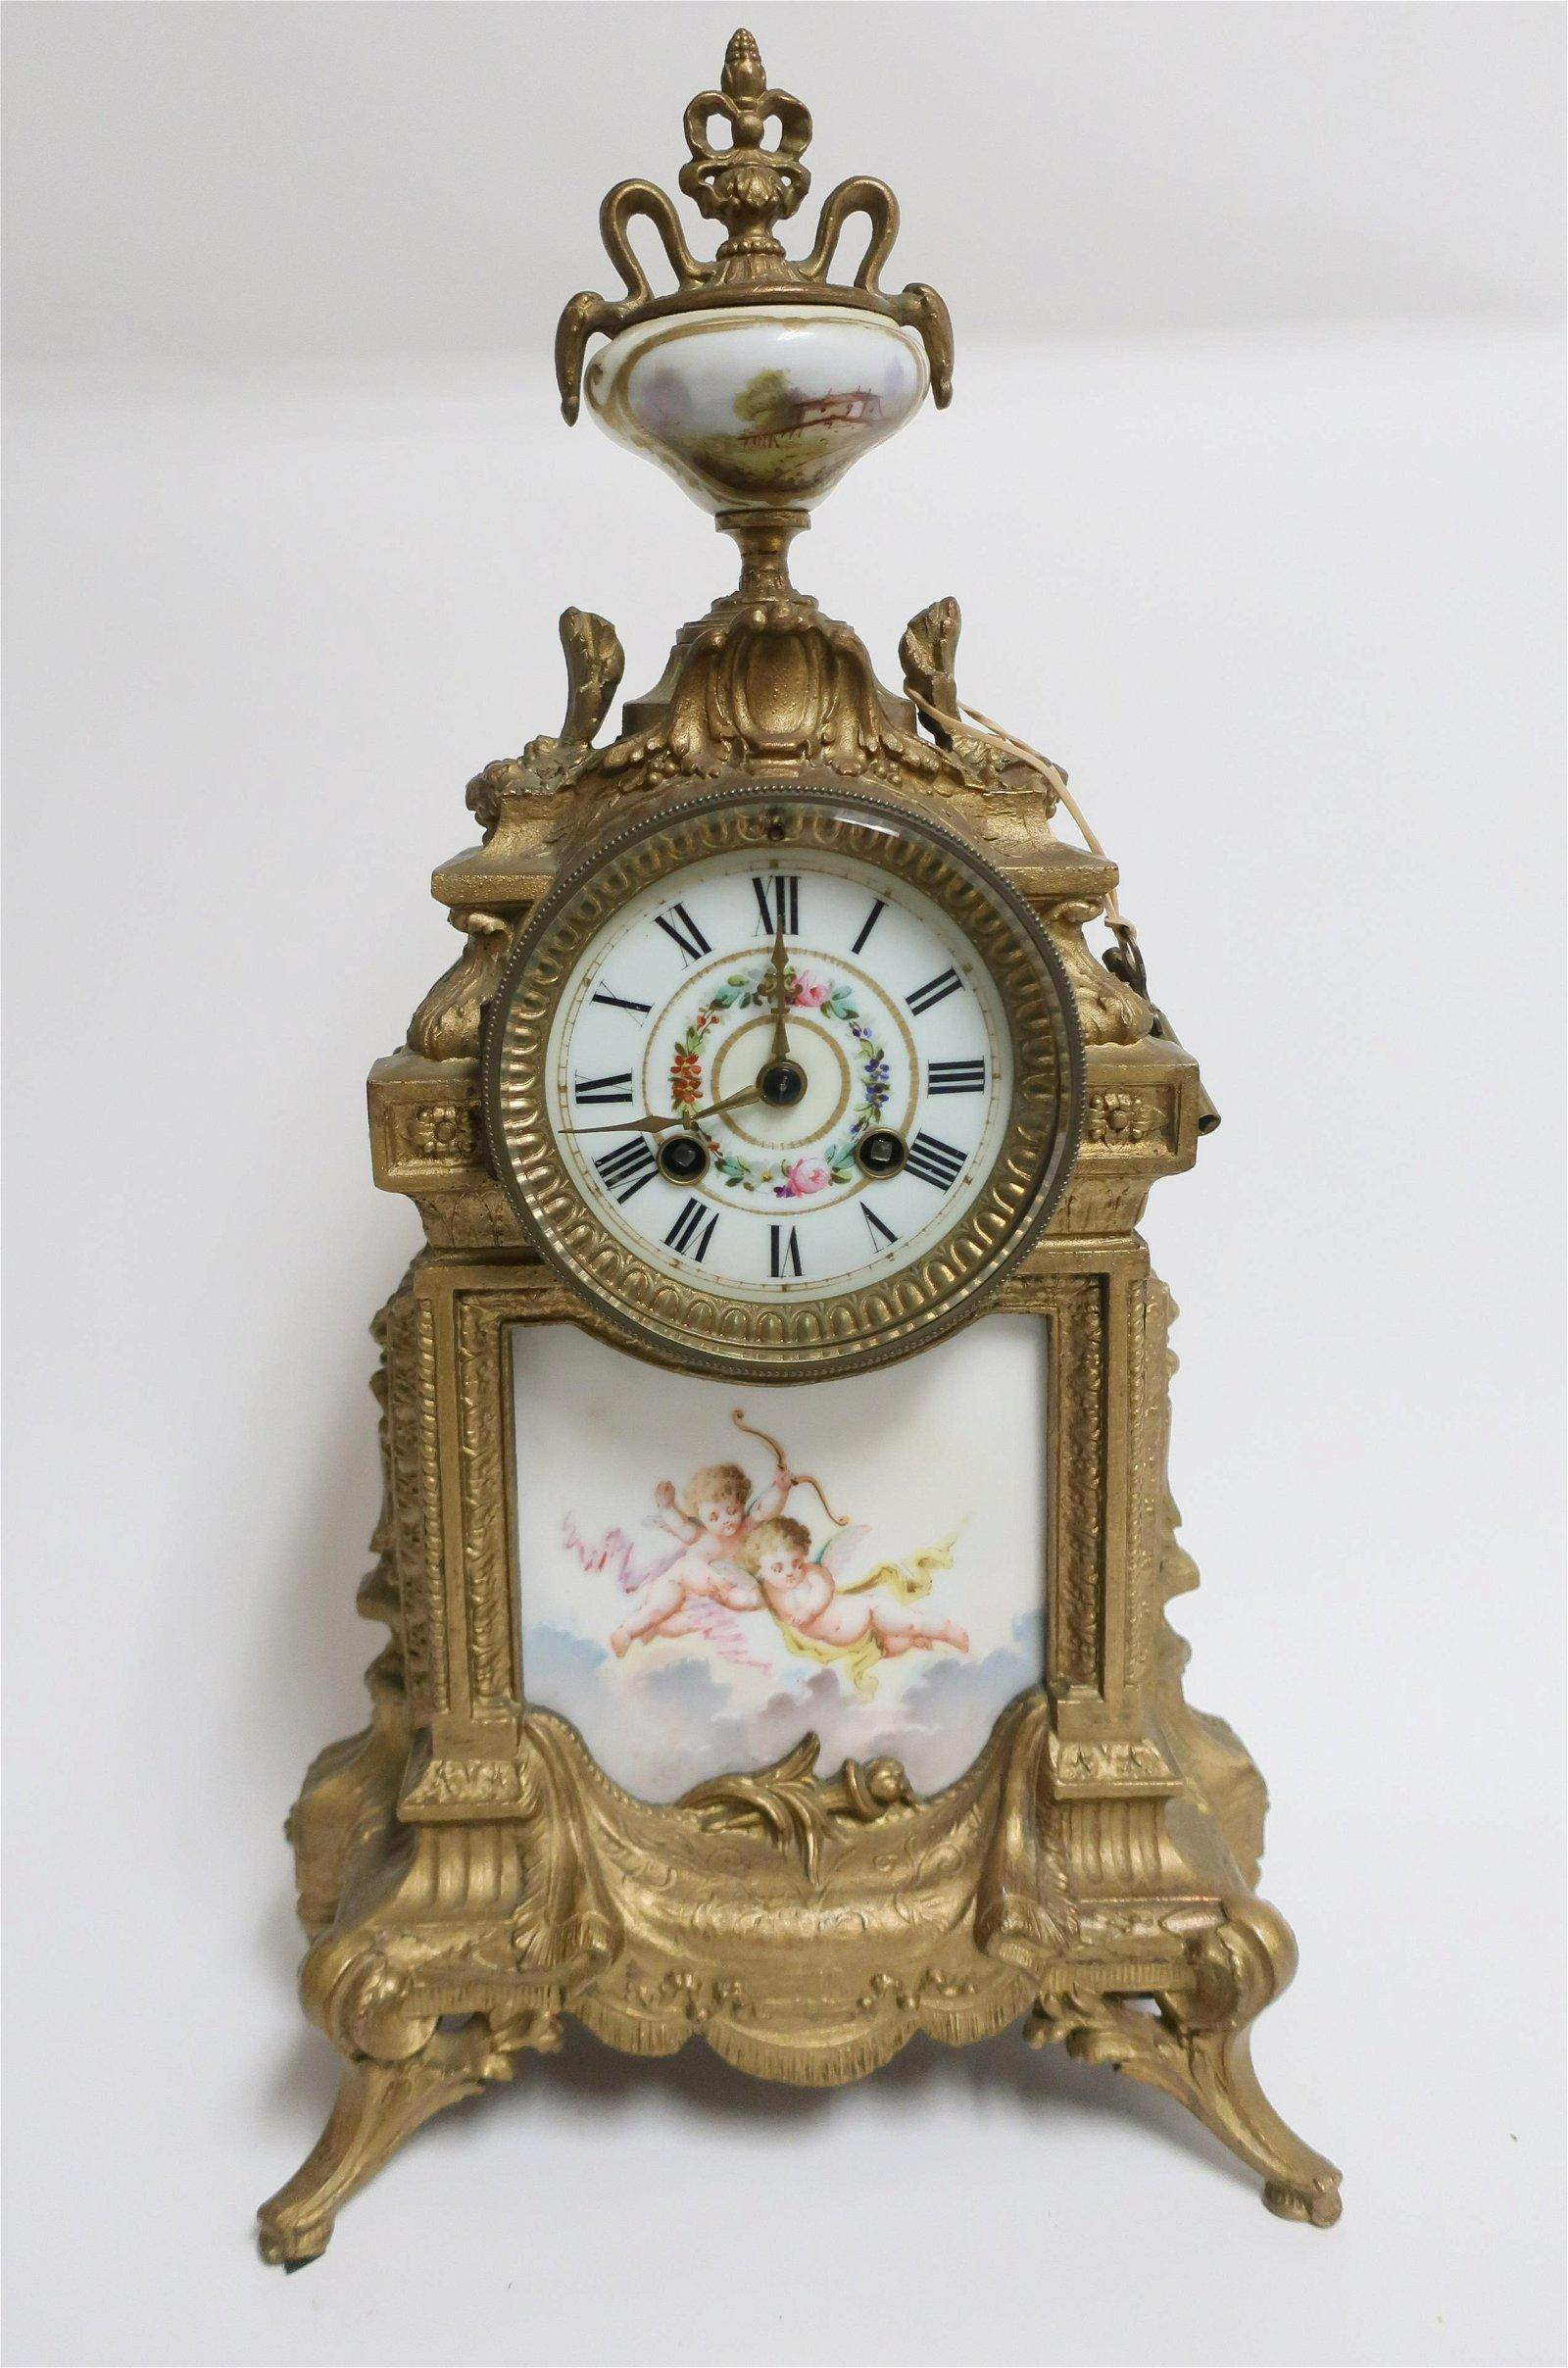 Louis XVI Style Striking Mantle Clock, 19th C.